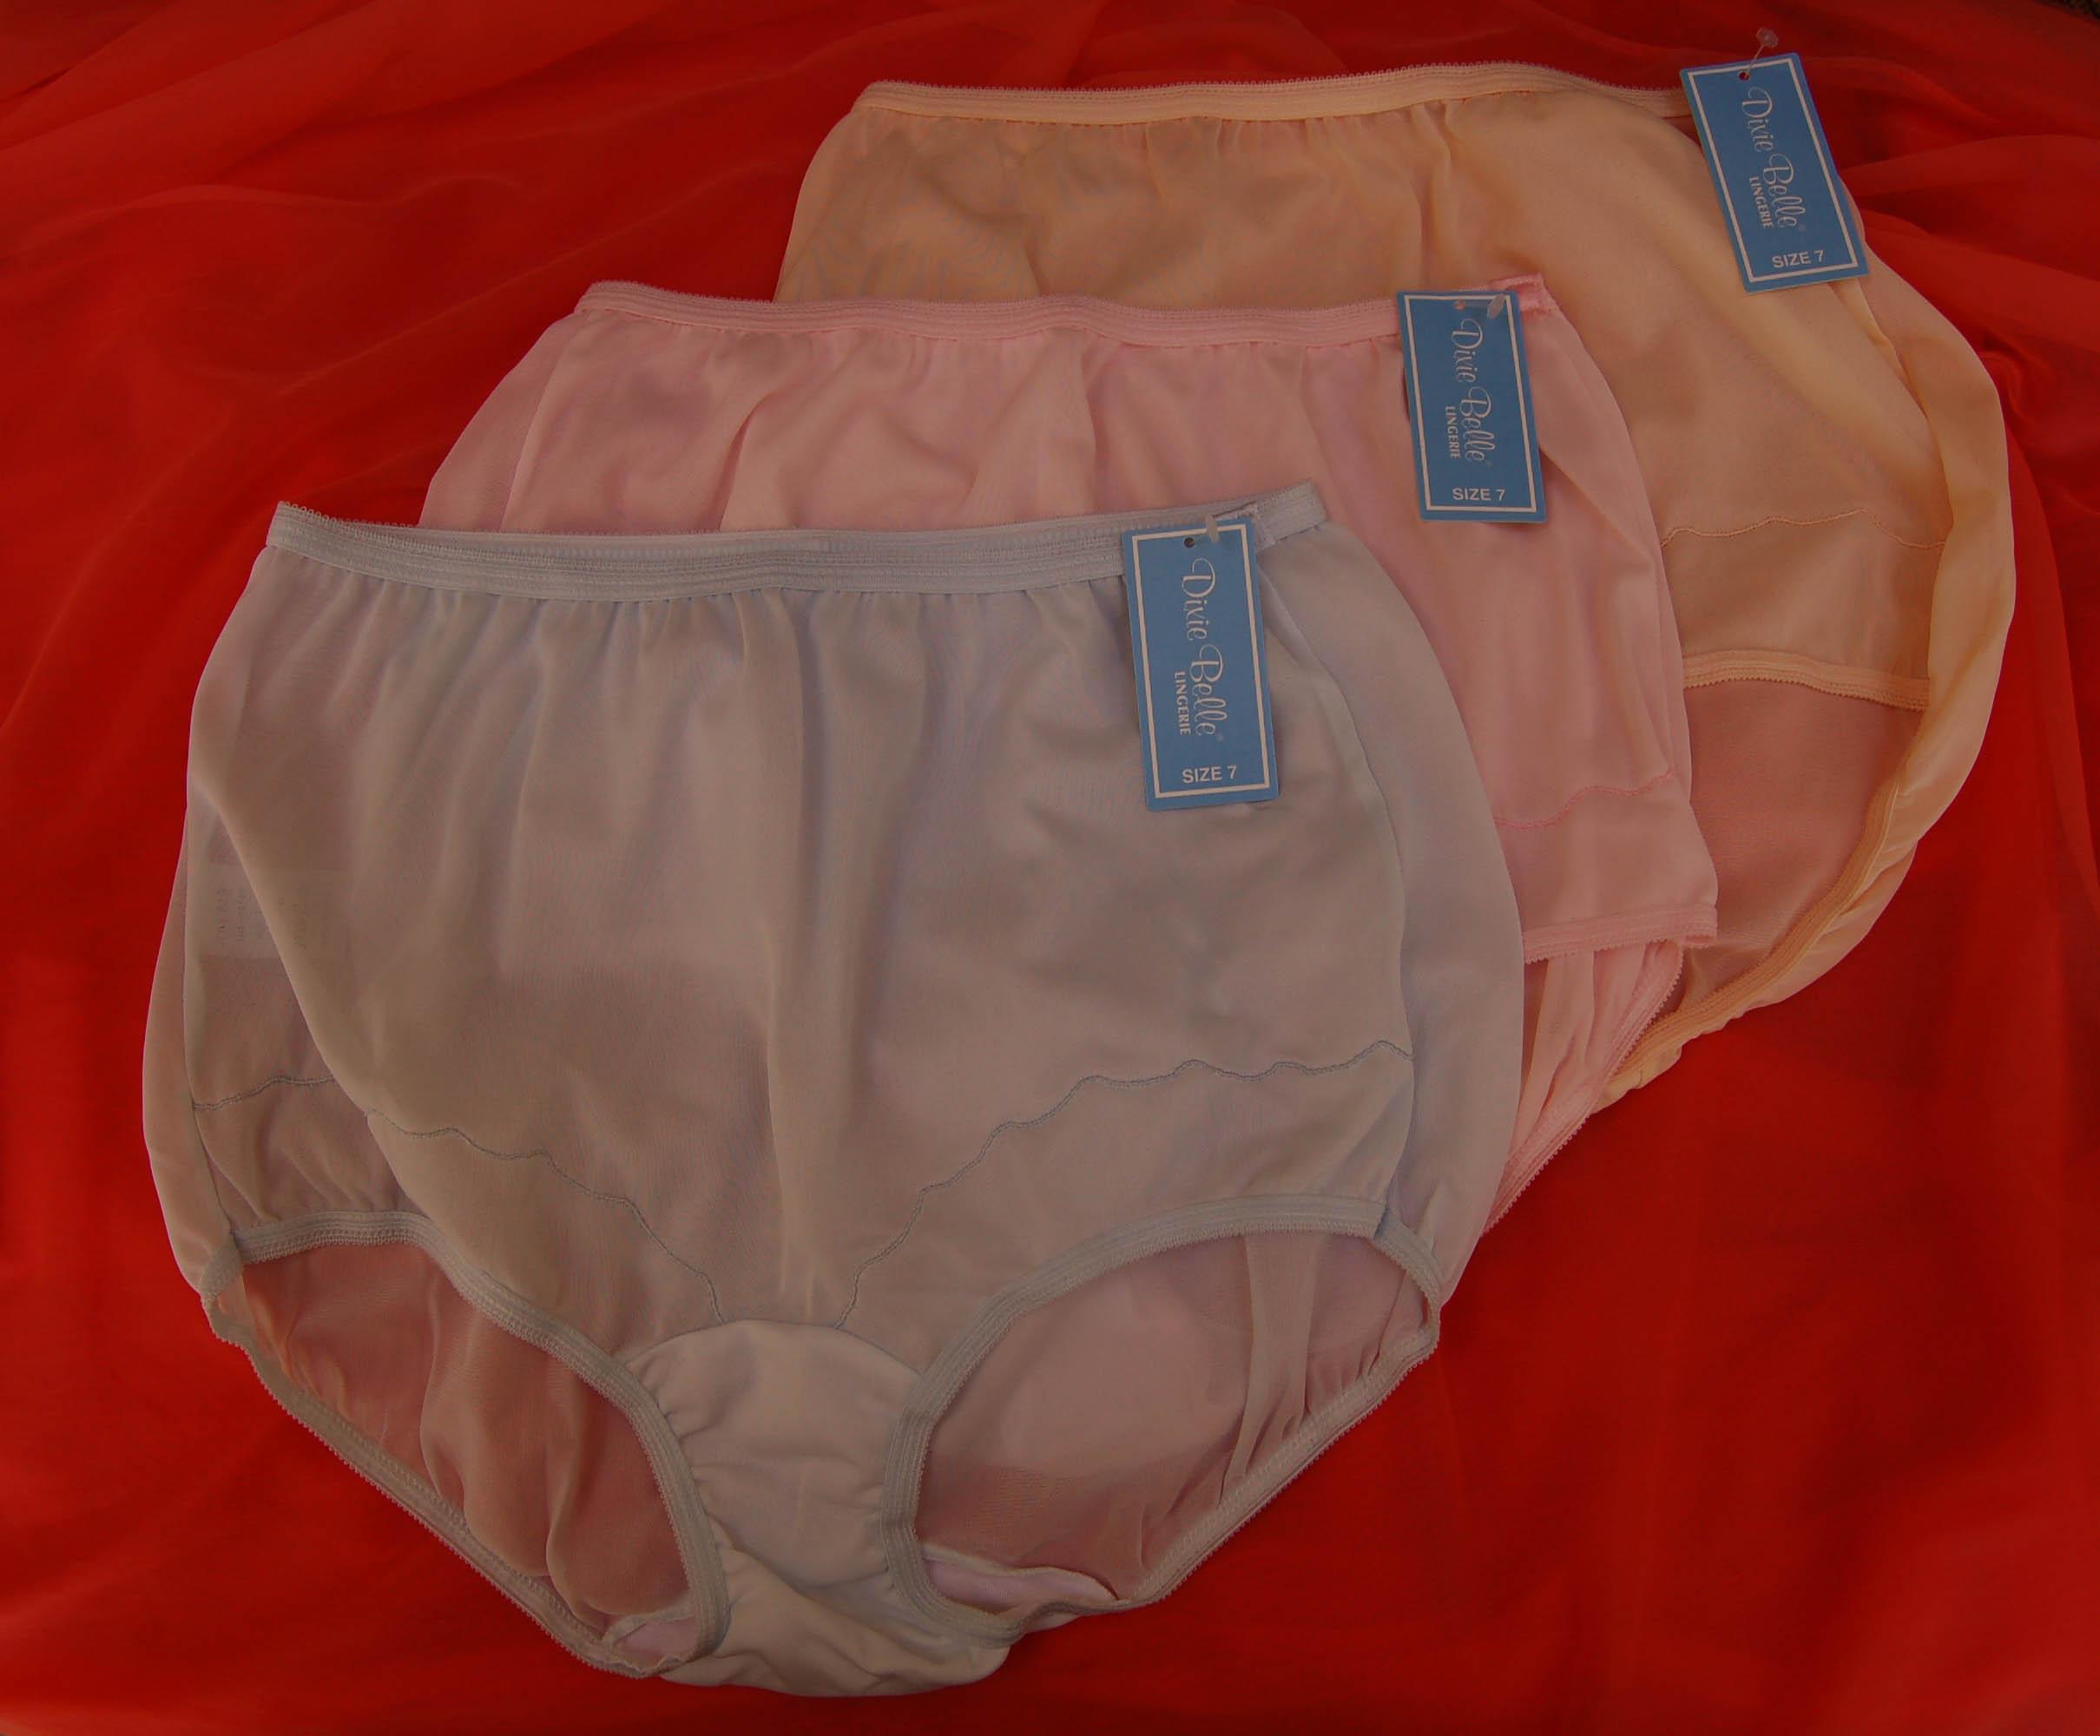 Nylon Brief Panty 115